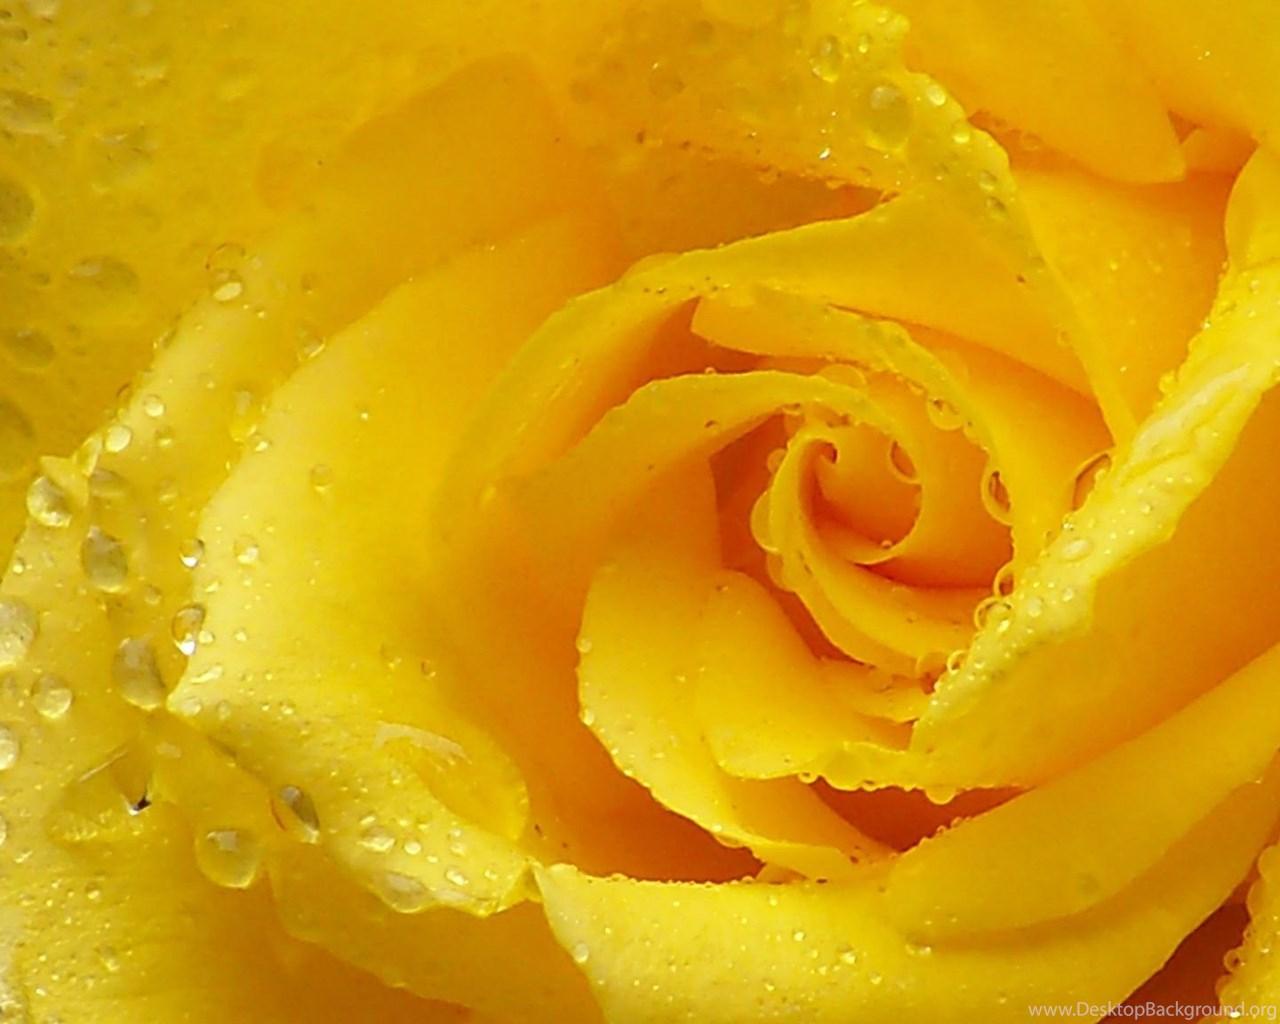 download wallpapers 2048x1152 rose, yellow rose, petals, drops